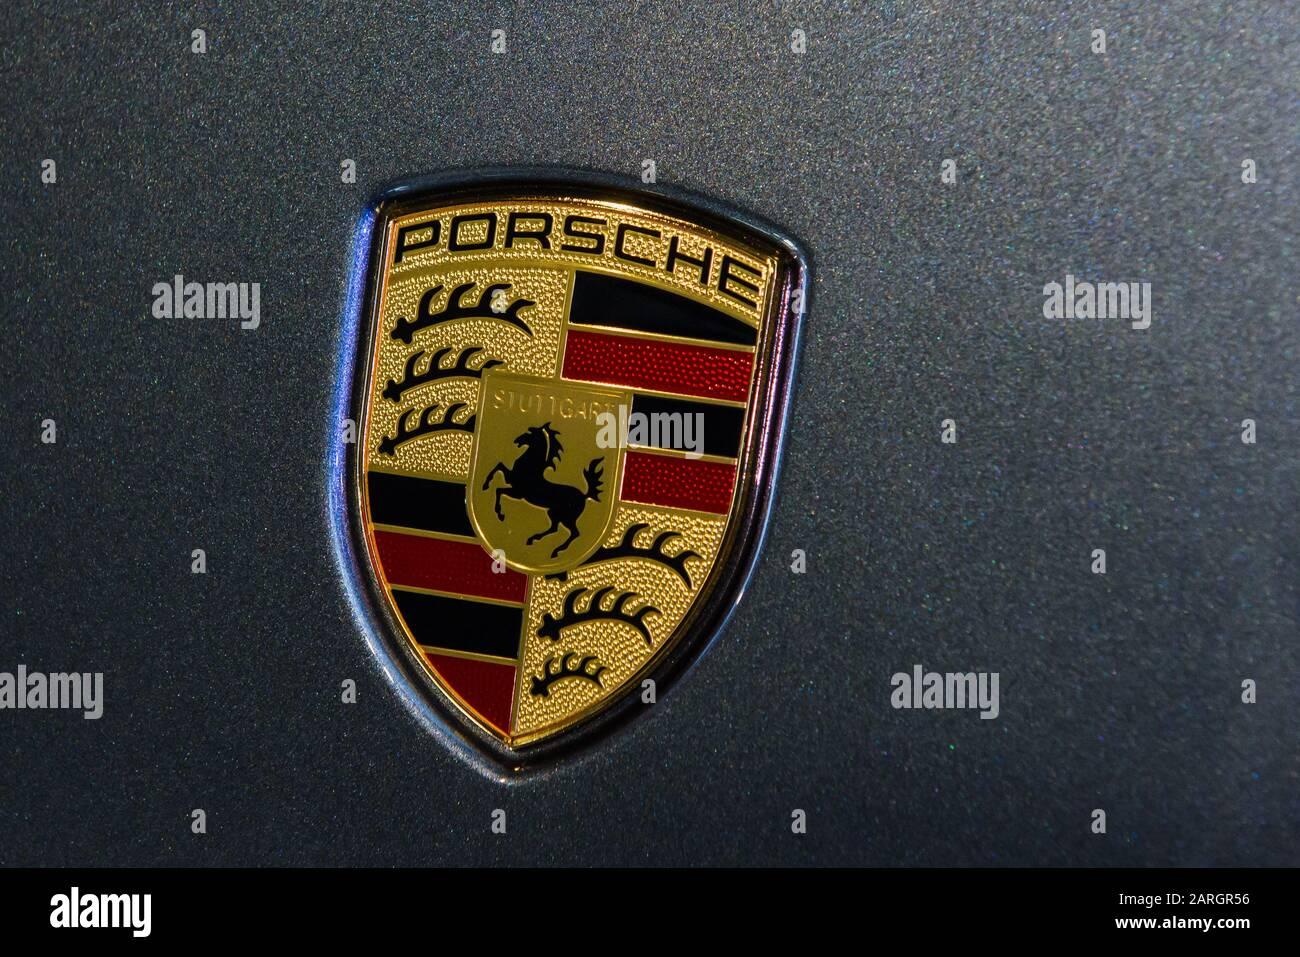 Porsche Company Logo On Porsche Car High Resolution Stock Photography And Images Alamy